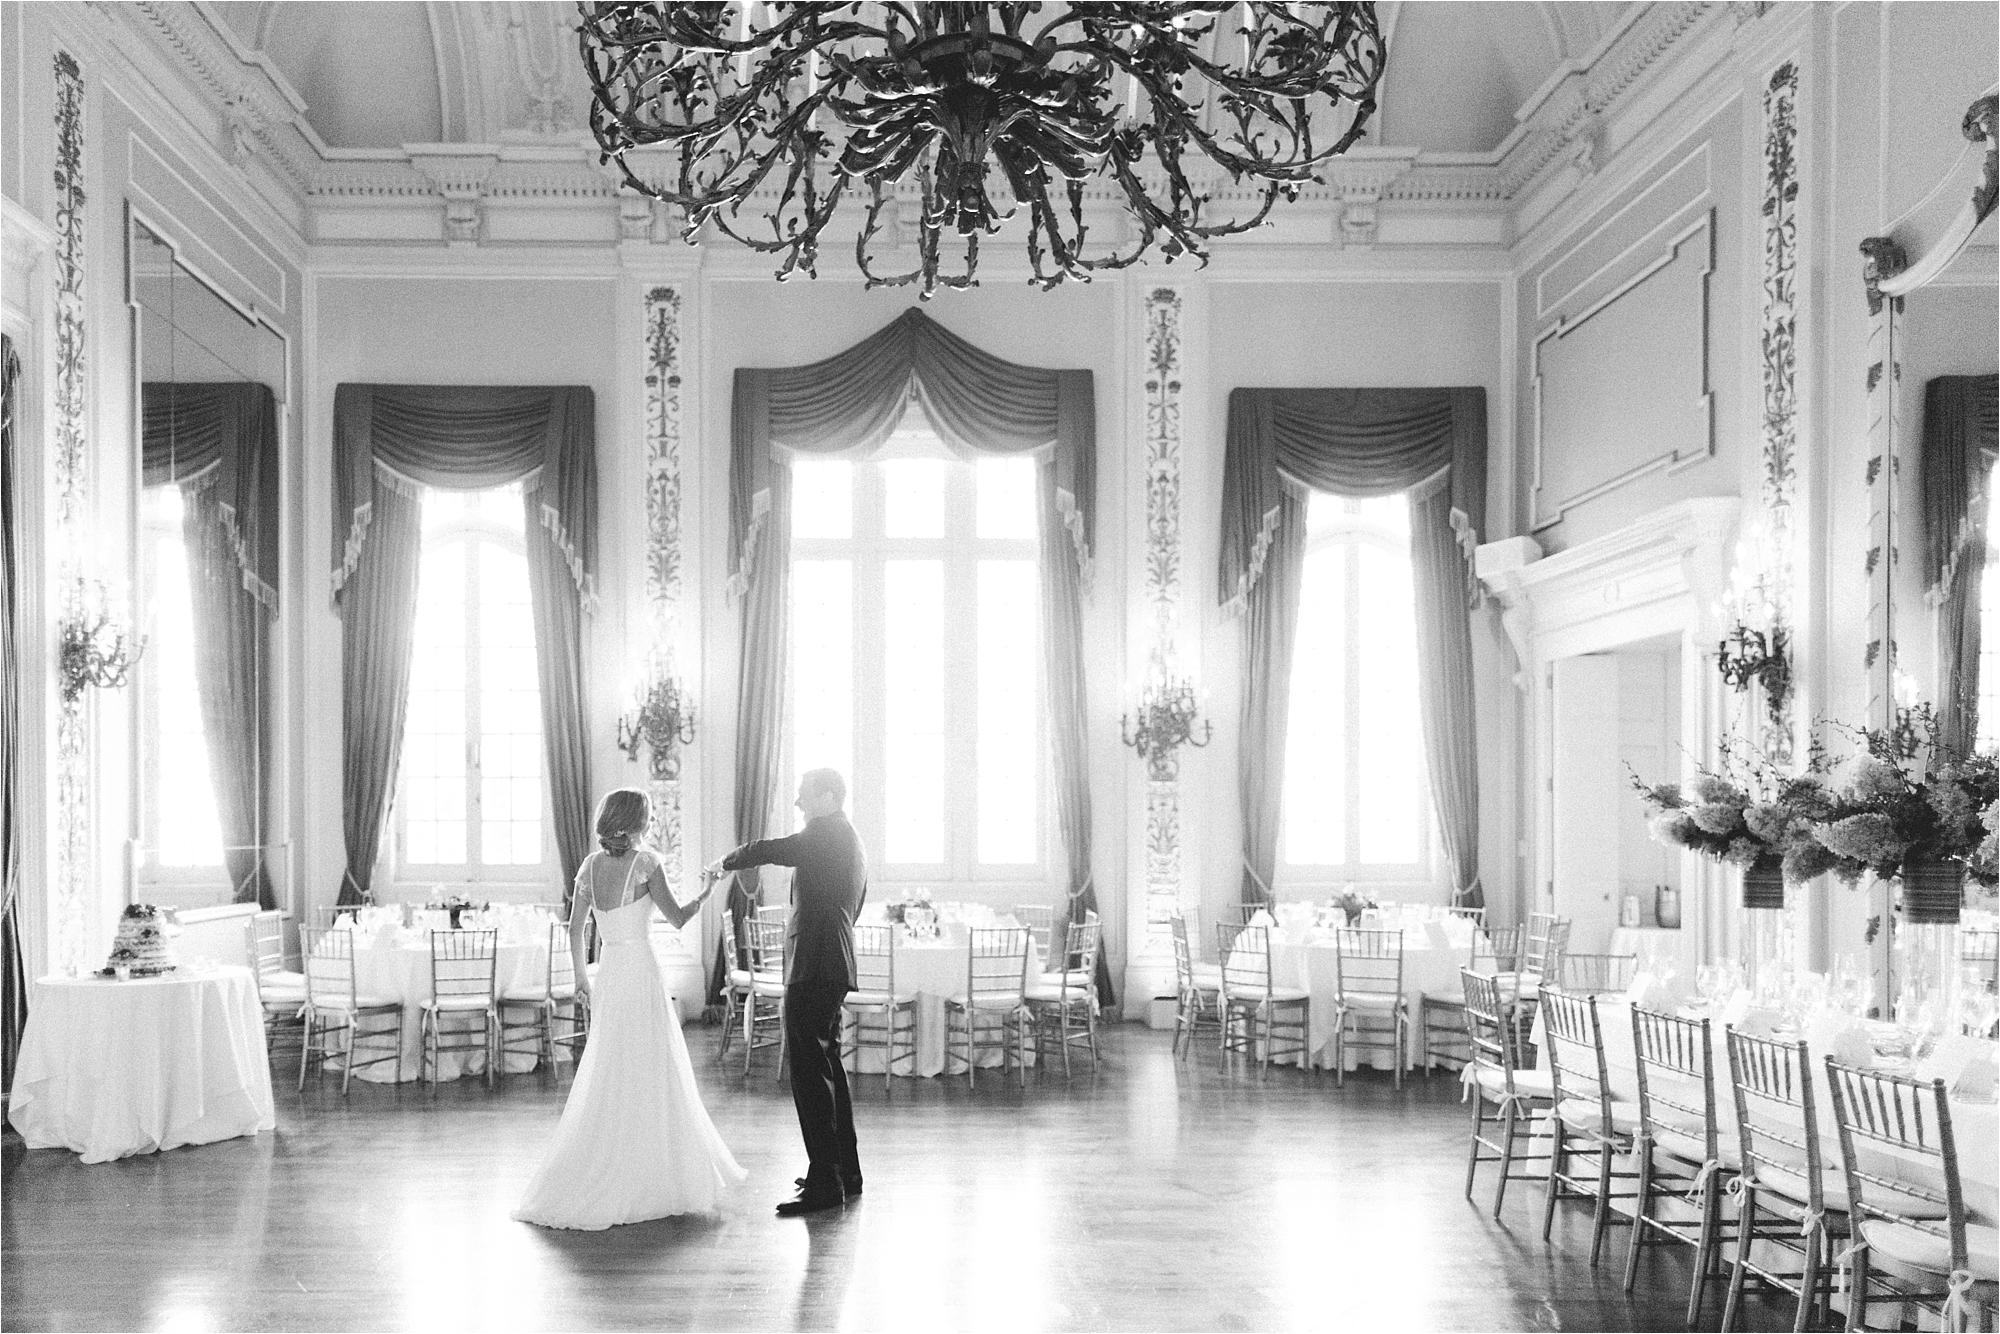 stephanie-yonce-photography-elegant-private-club-washington-dc-wedding-photos_0040.jpg